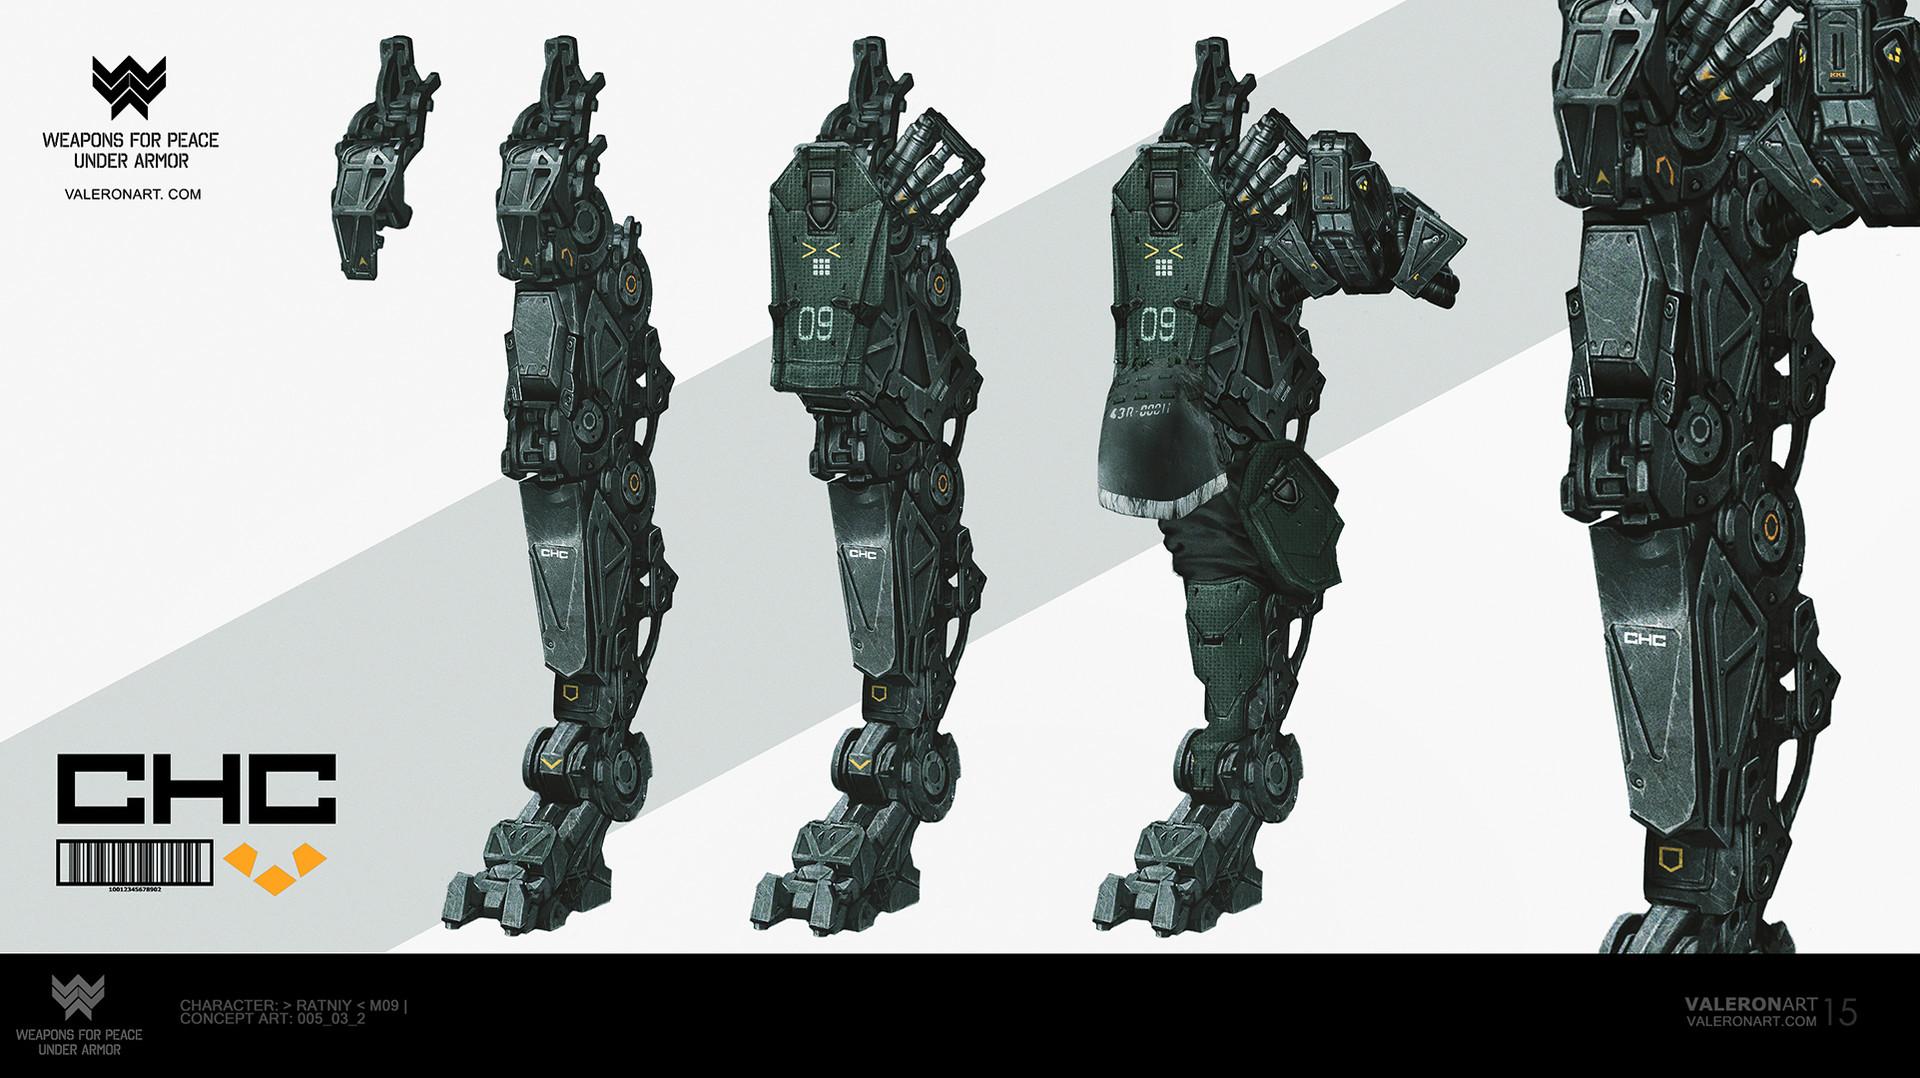 Val orlov 008 wpf ratniy concept 007